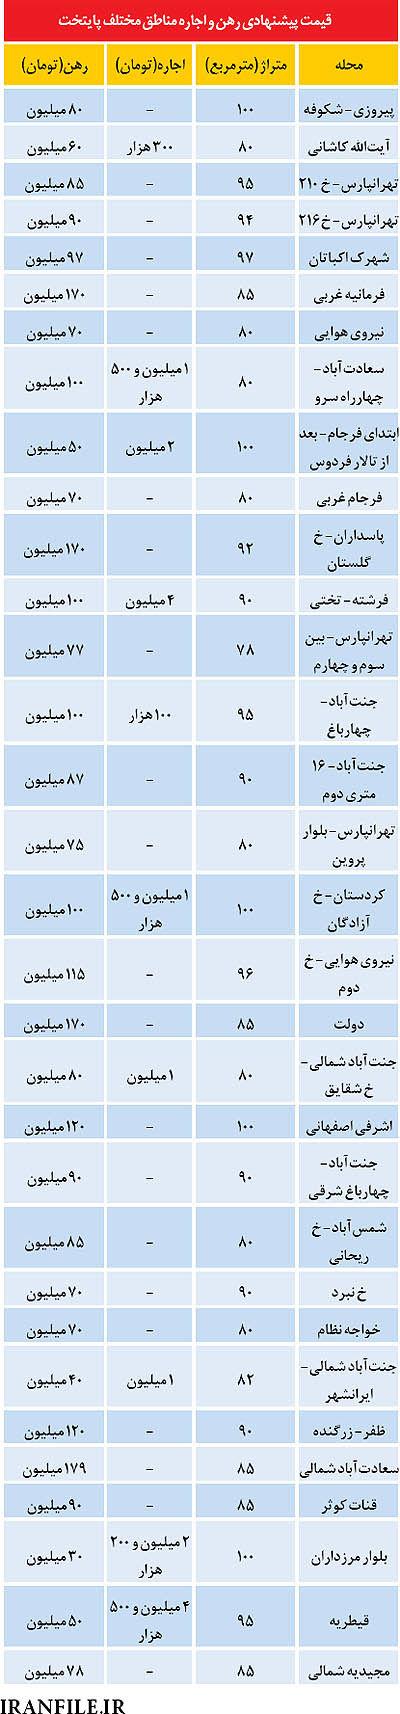 http://www.afkarnews.ir/images/docs/files/000378/nf00378985-1.jpg